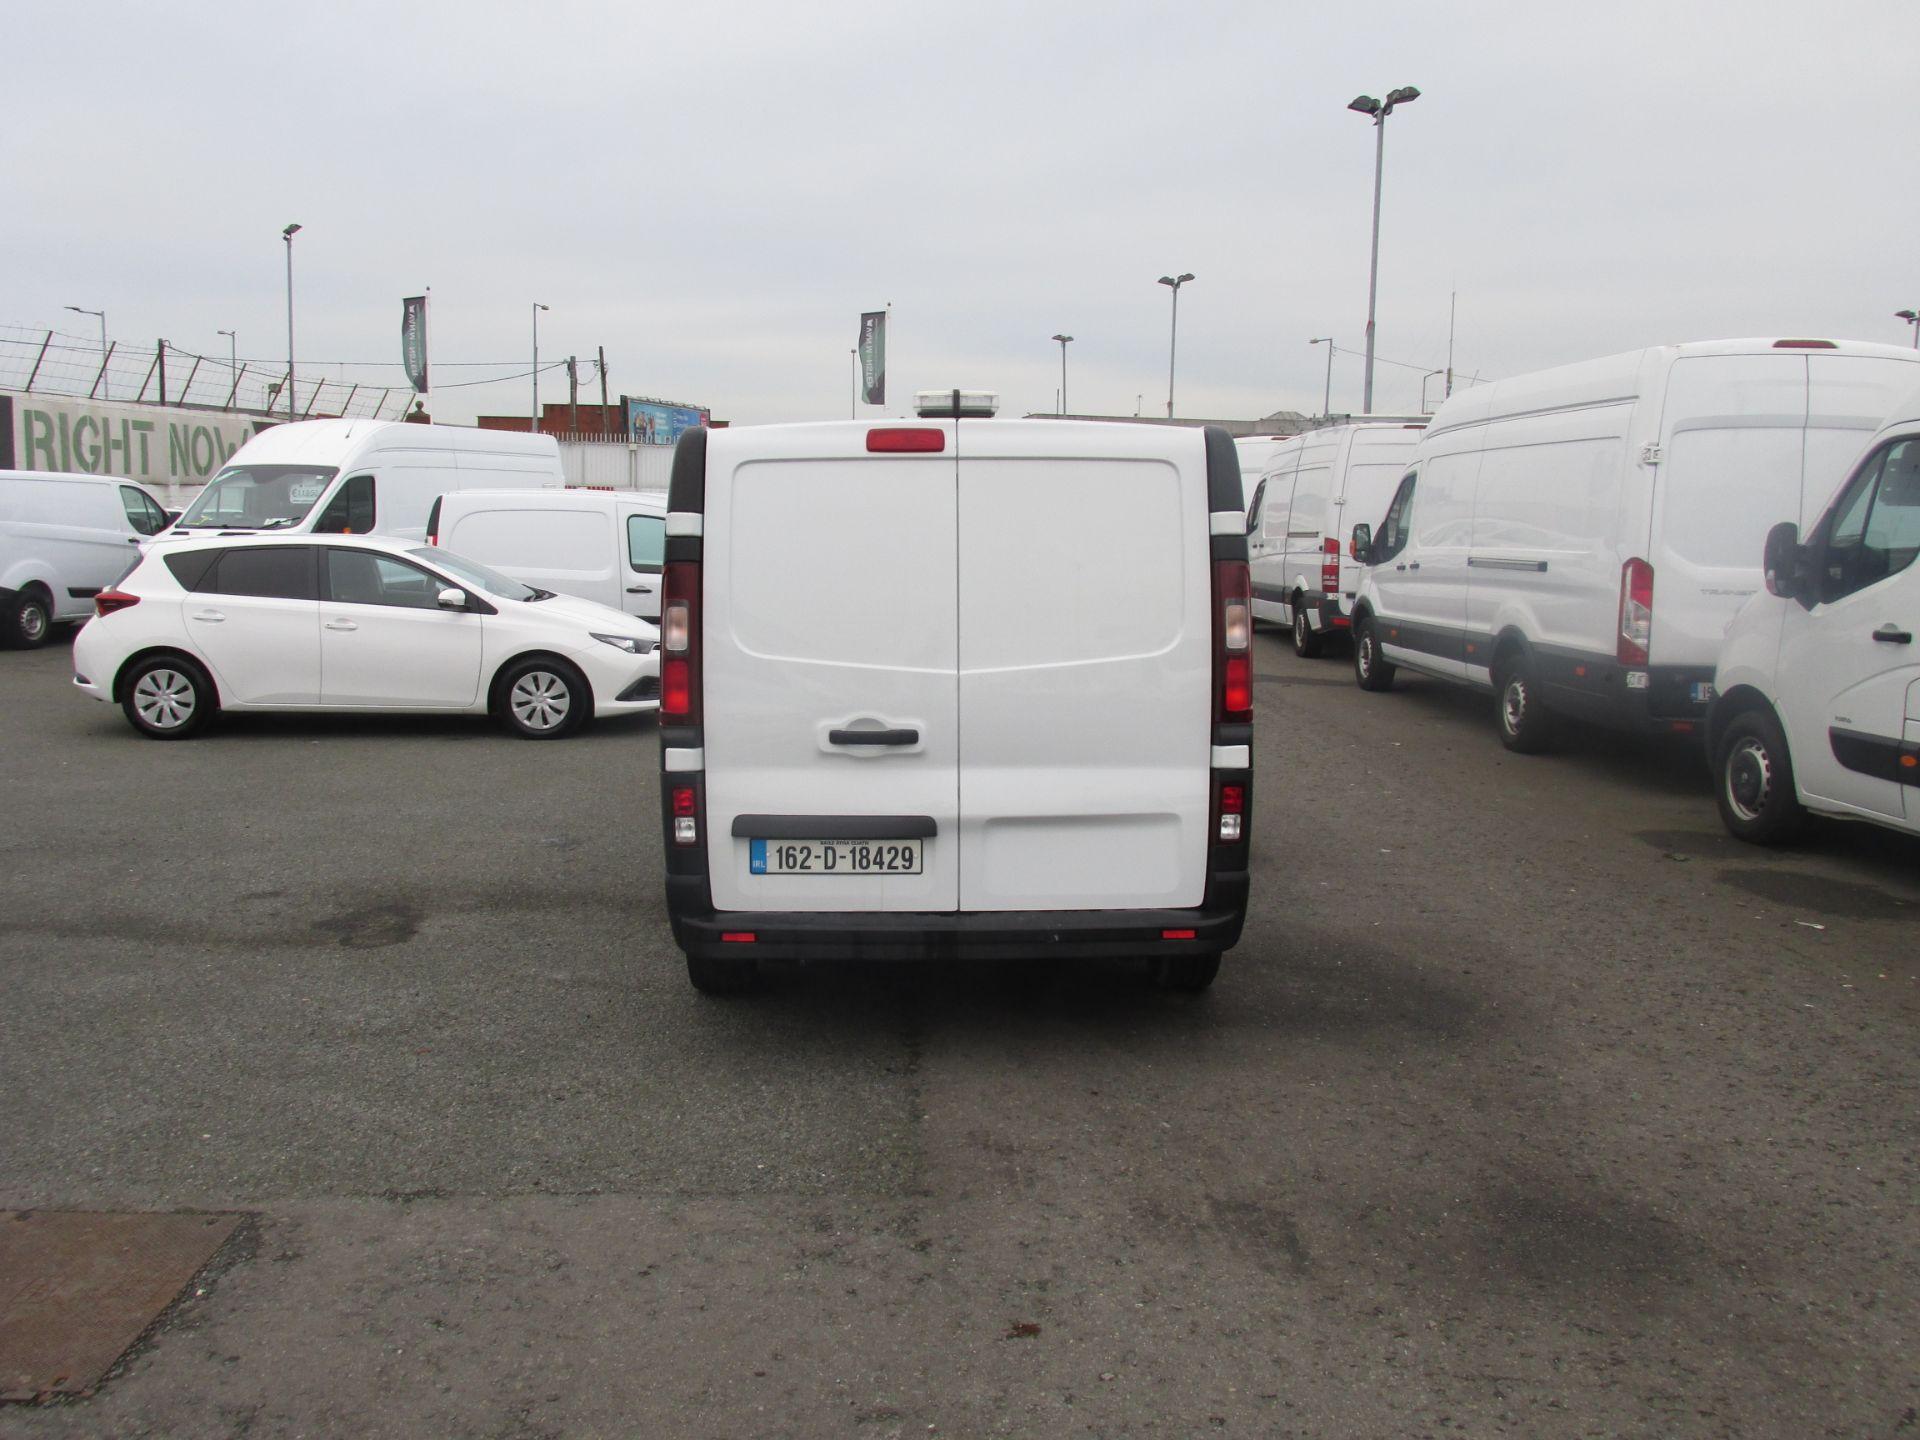 2016 Renault Trafic LL29 DCI 115 Business Panel VA (162D18429) Image 6